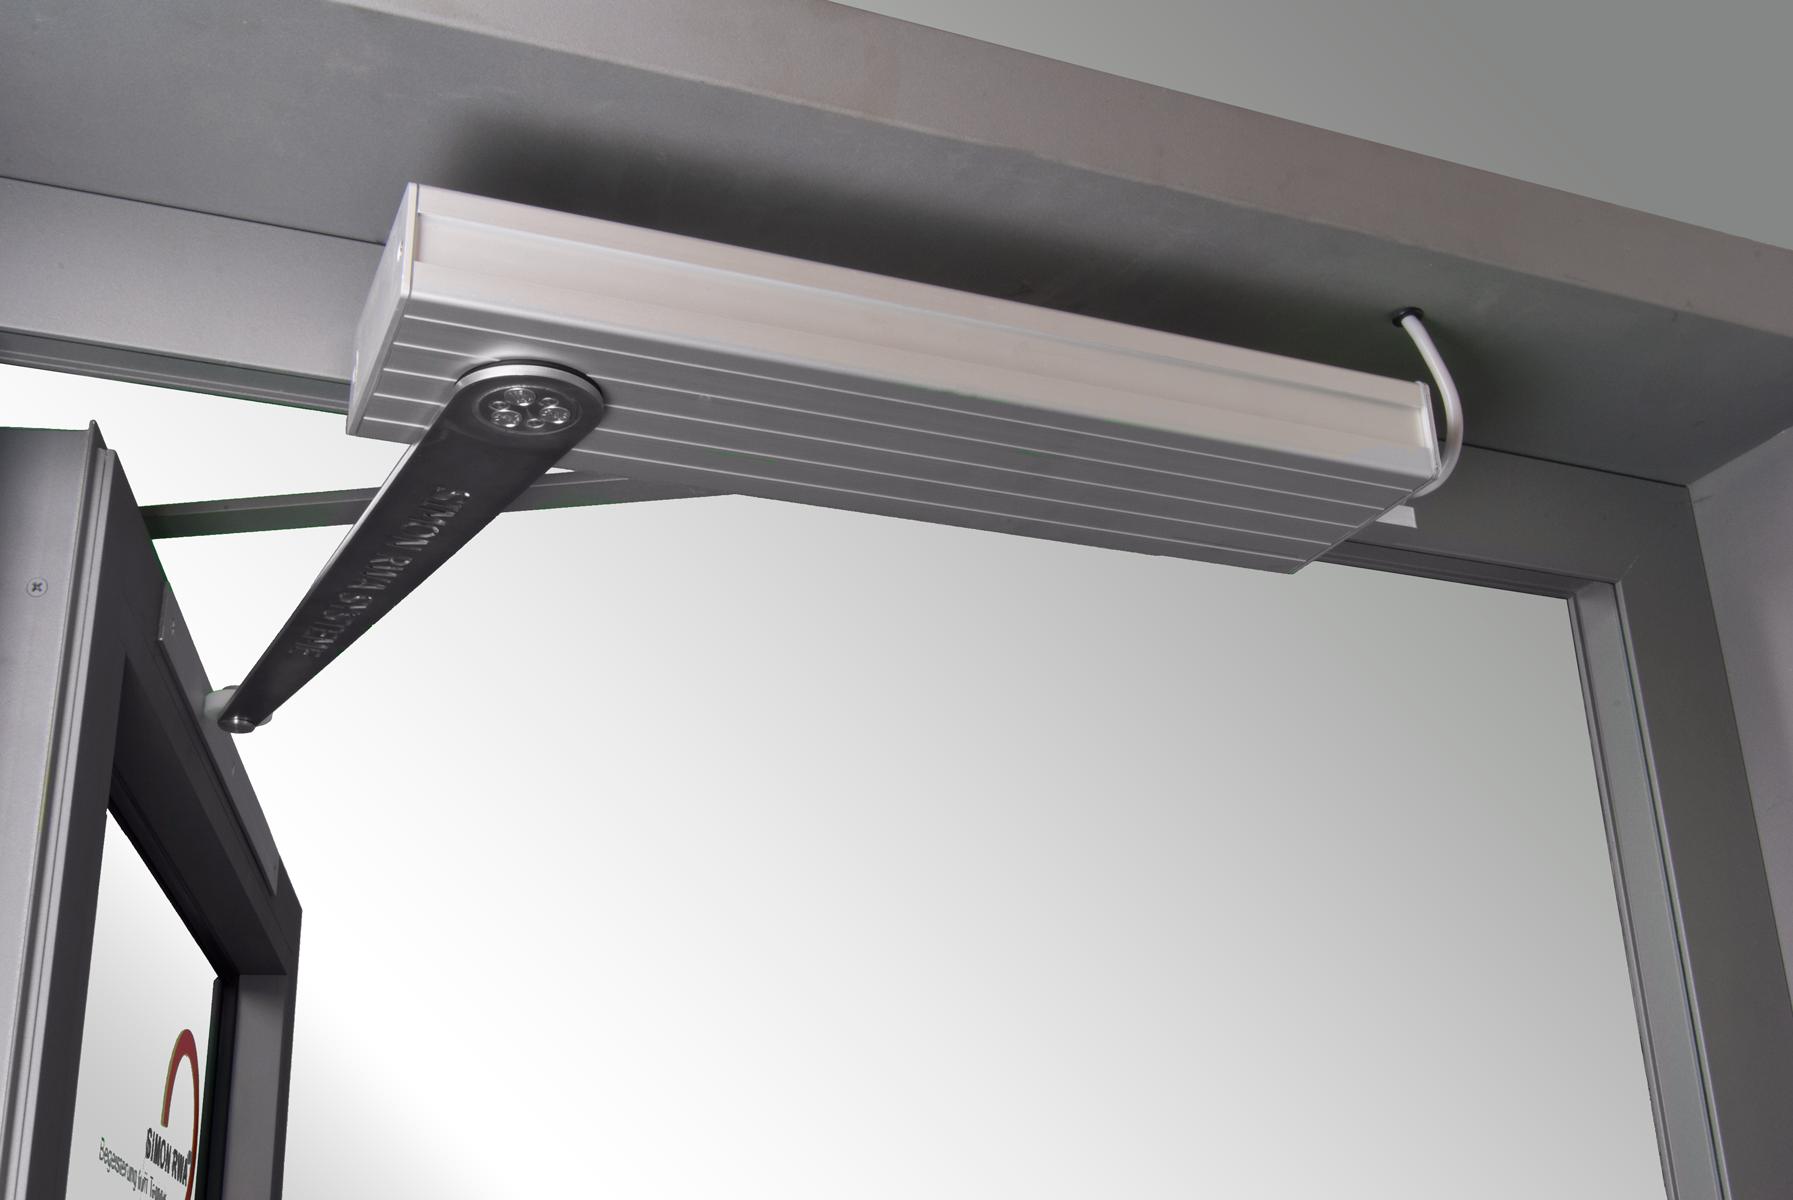 PA-KL2-T / EA-KL2-T folding arm² mounted